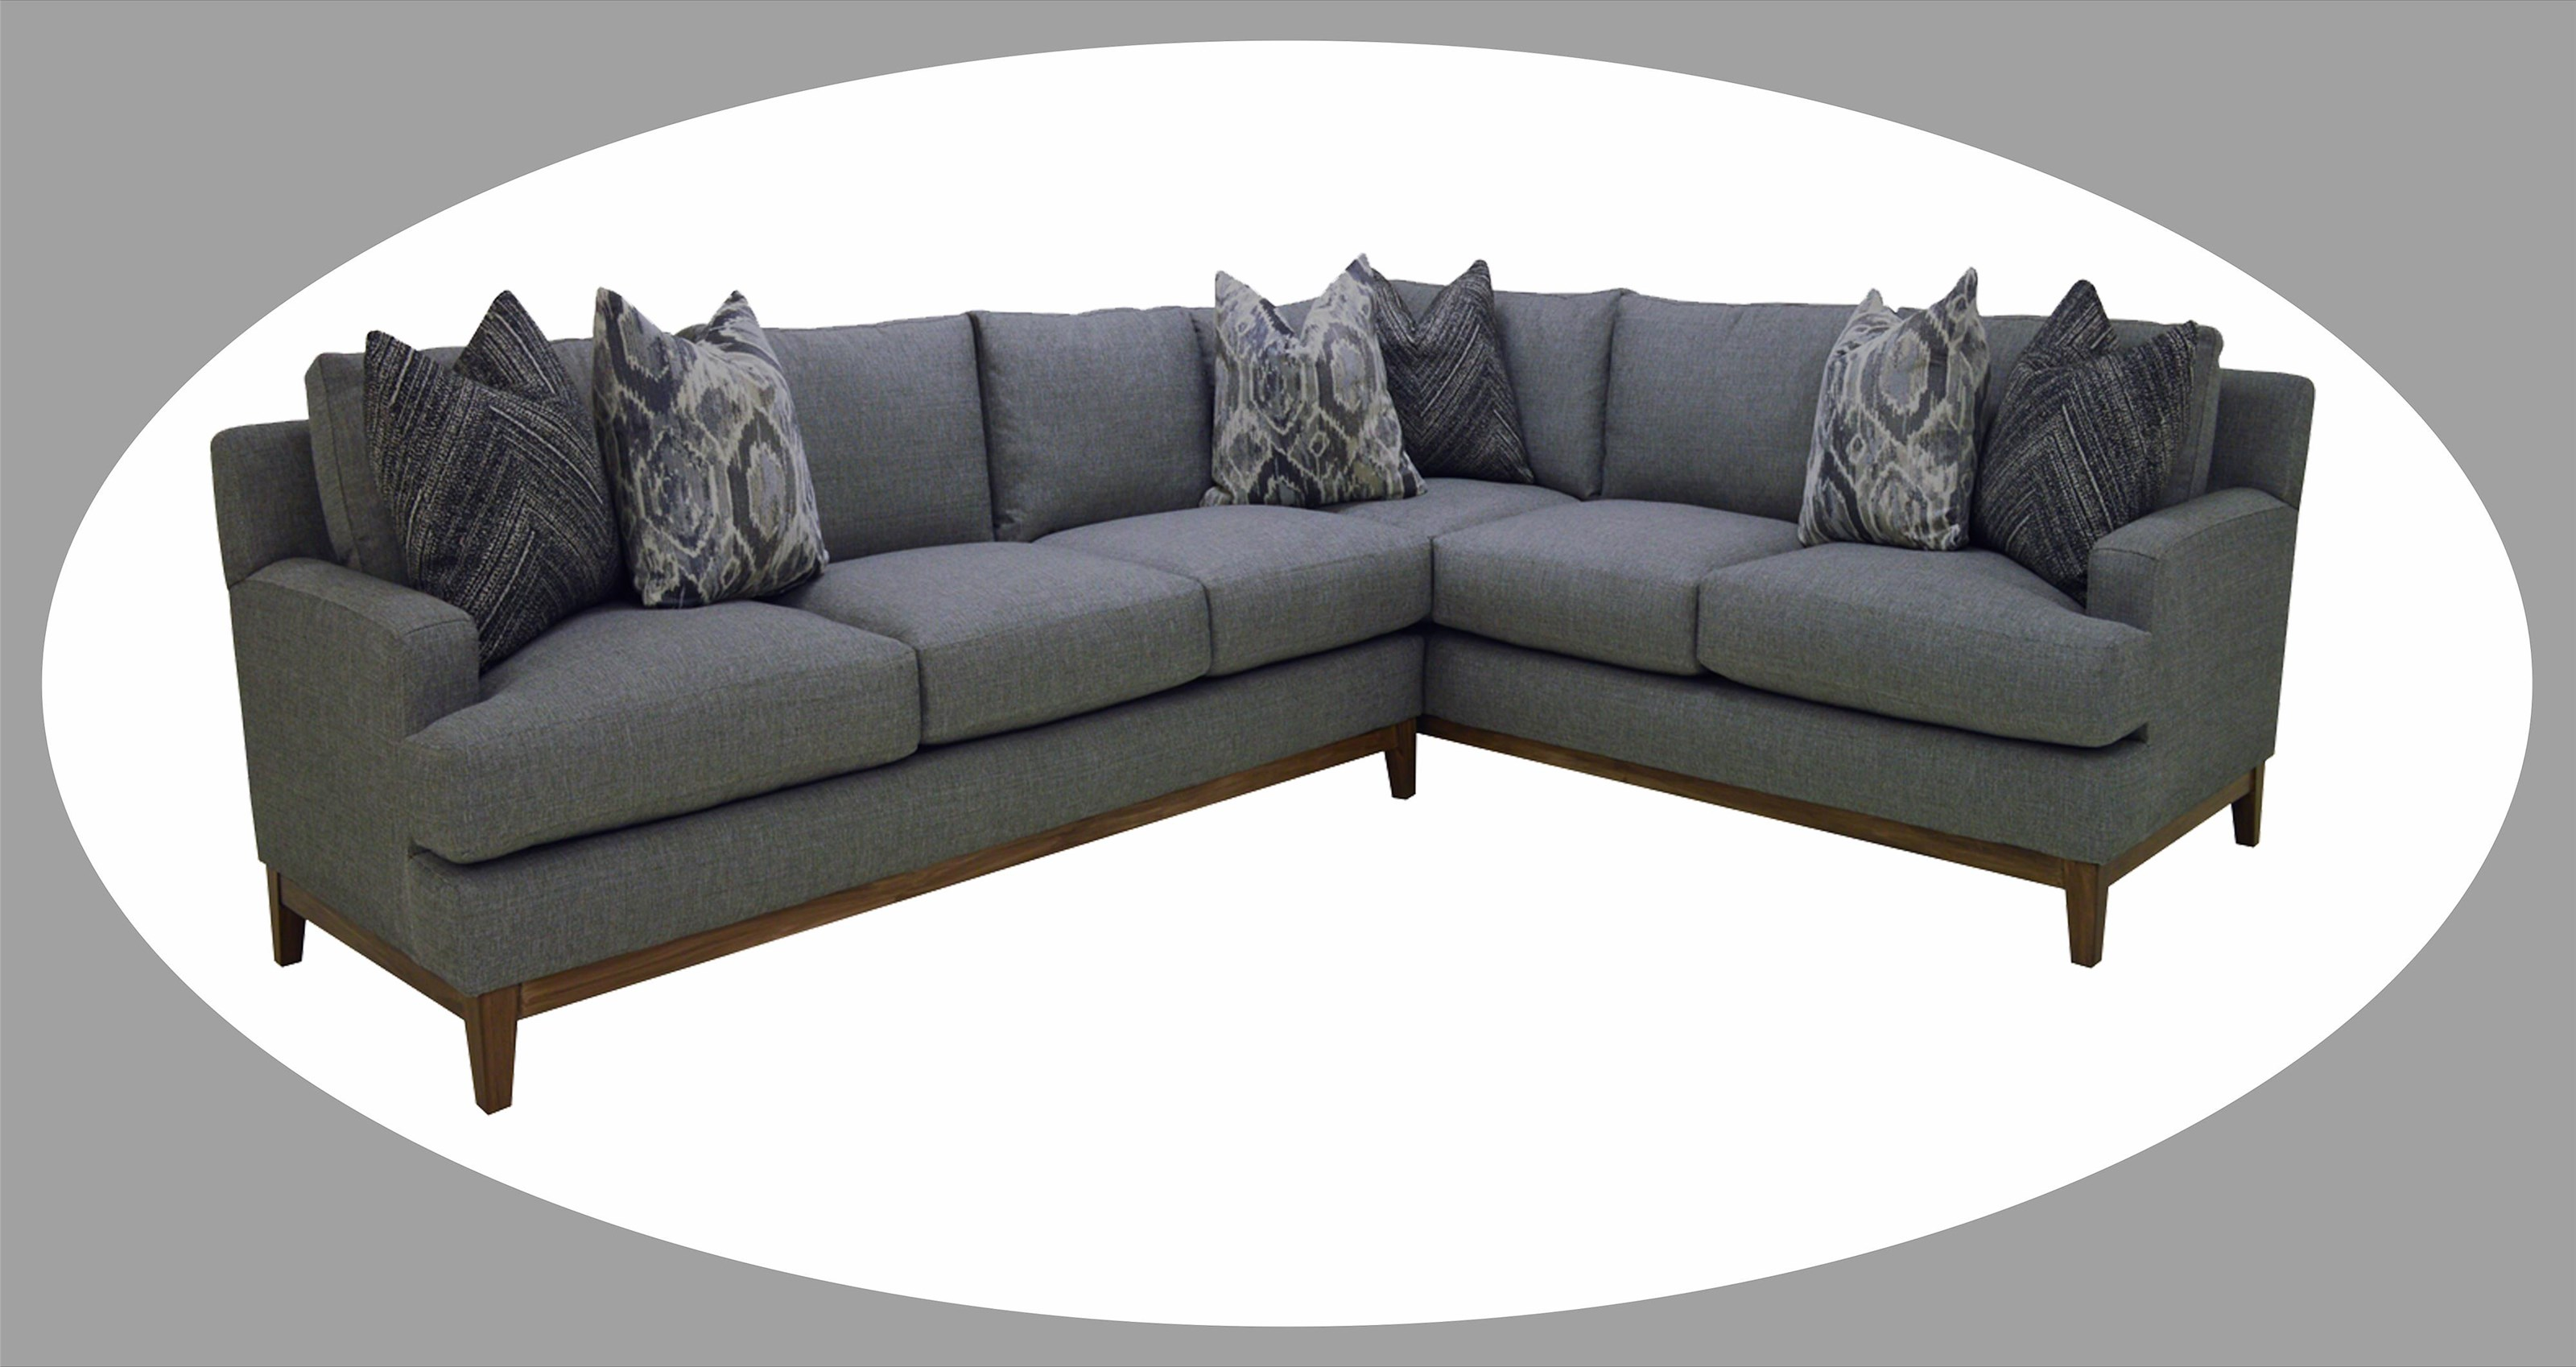 sectional sofas boston diamond sofa jazz reeds trading company 5 seat furniture item number 6071da 05 06